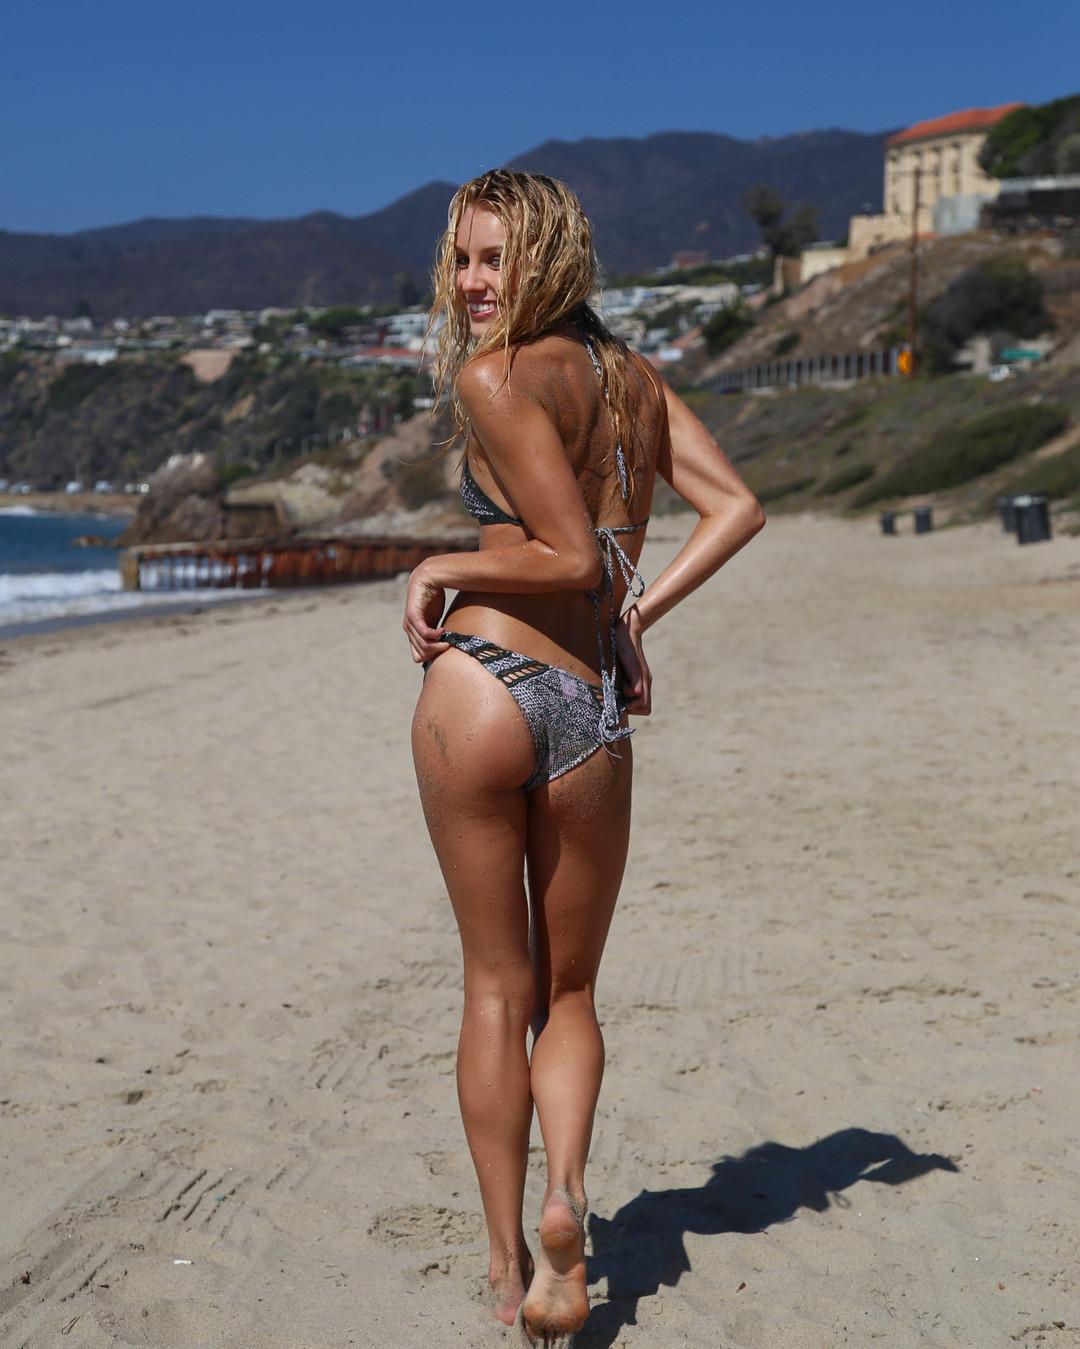 Bikini Meghan Engler naked (79 photos), Tits, Bikini, Boobs, swimsuit 2020